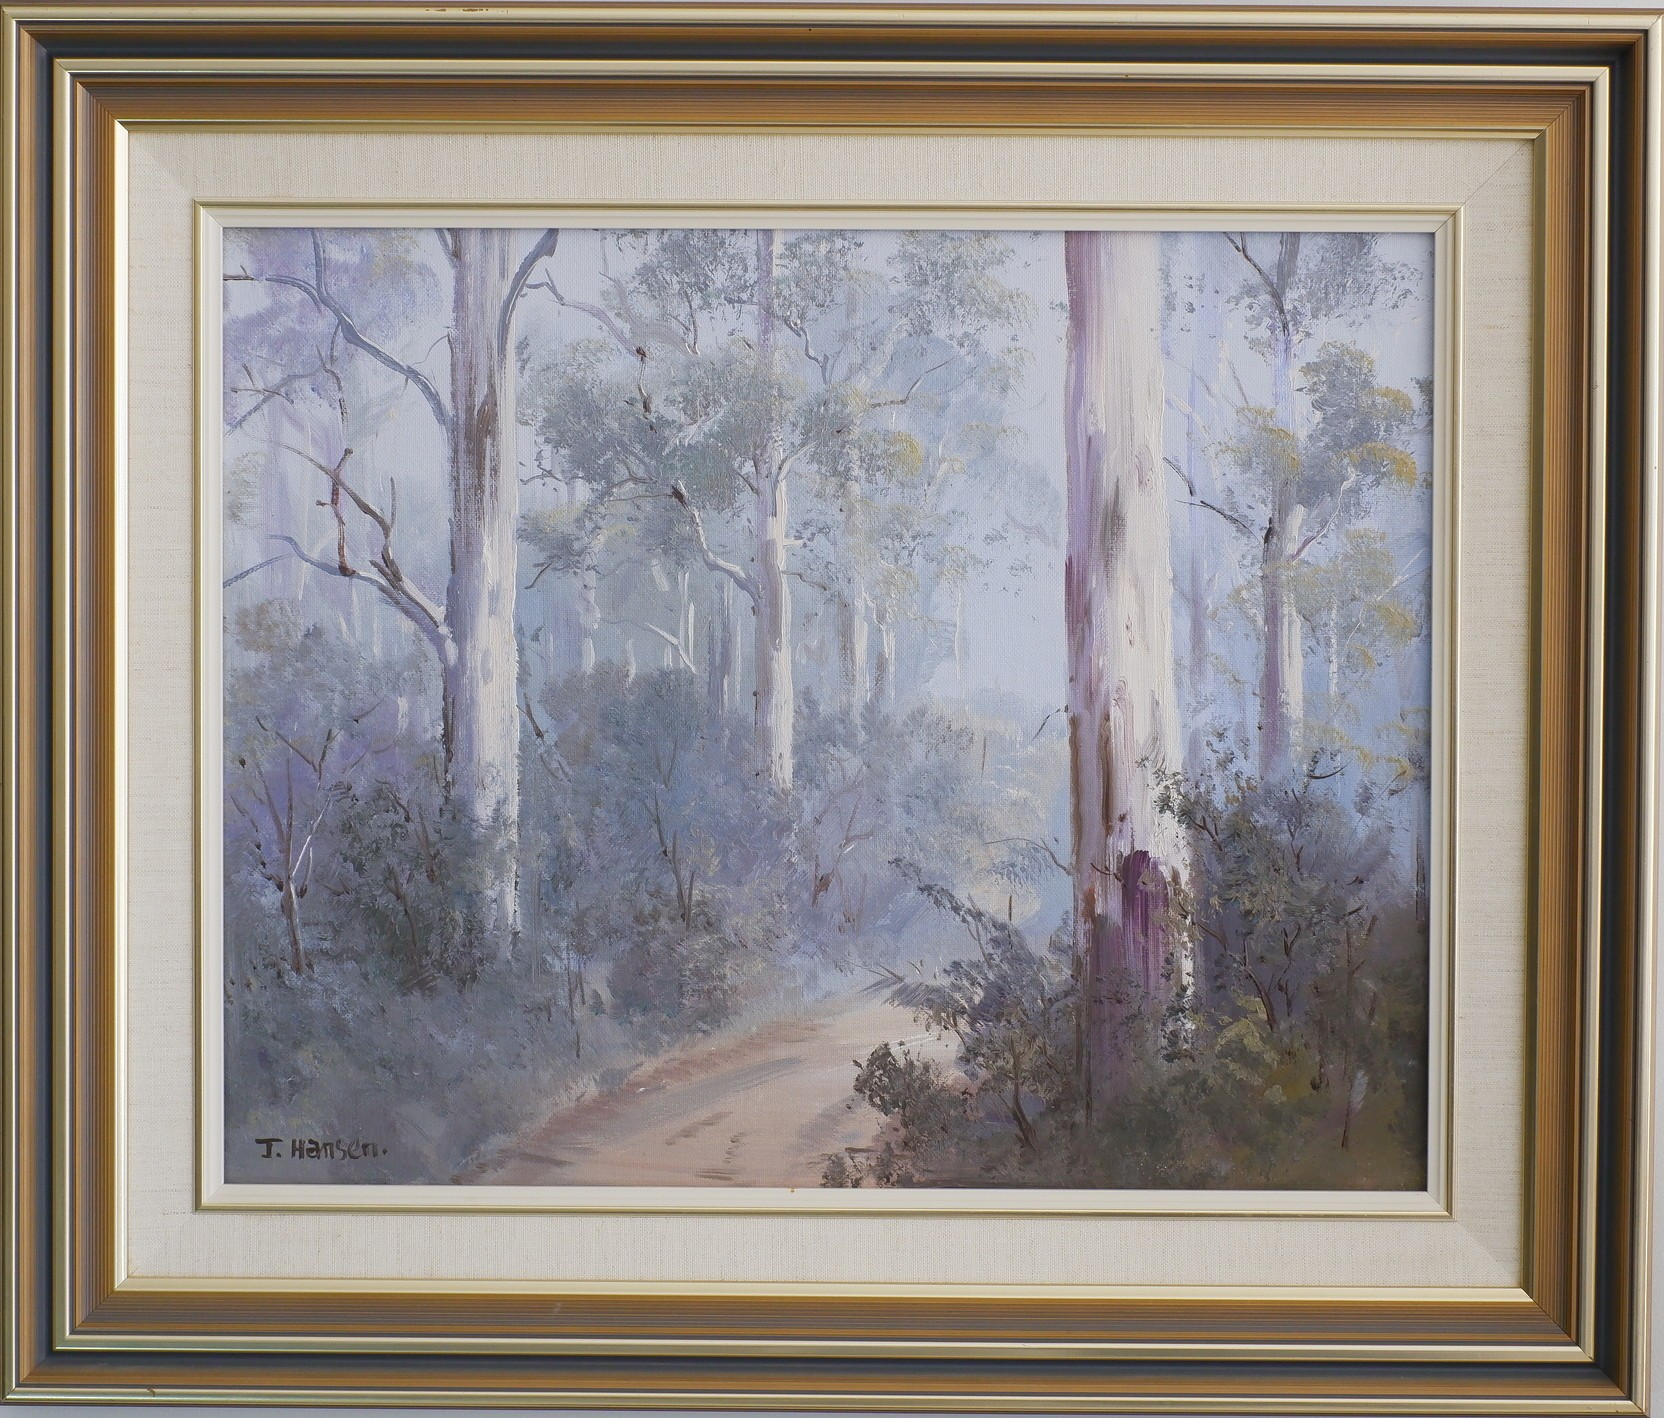 'John Hansen Forrest Mist Oil on Board'